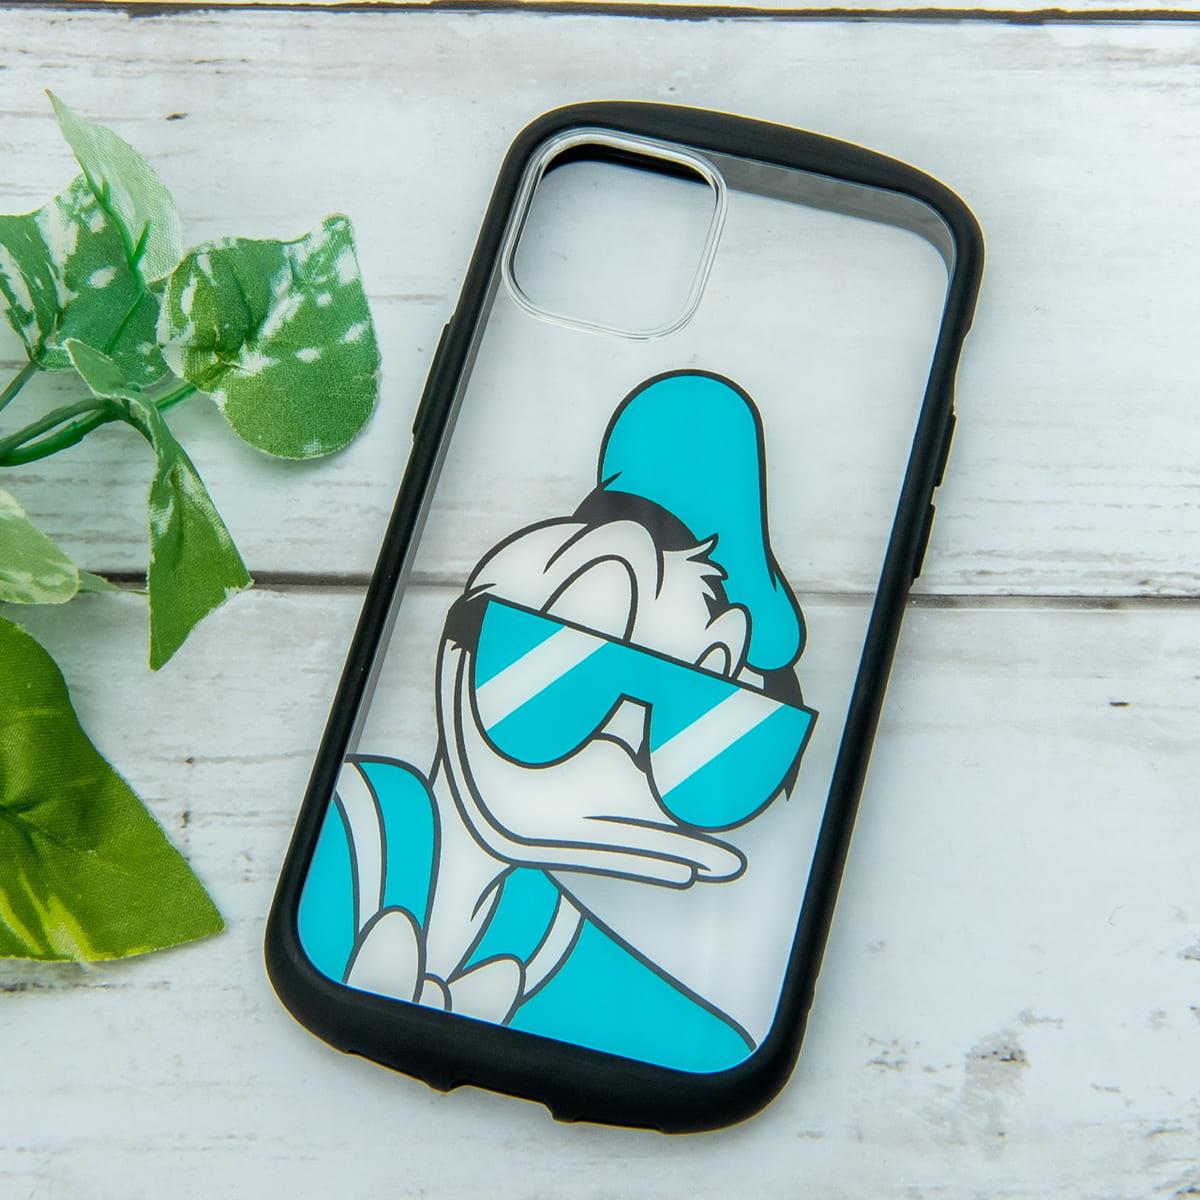 PGA「ディズニー」iPhone 12 mini、iPhone 12 /12 Pro用ガラスタフケース ドナルドダック